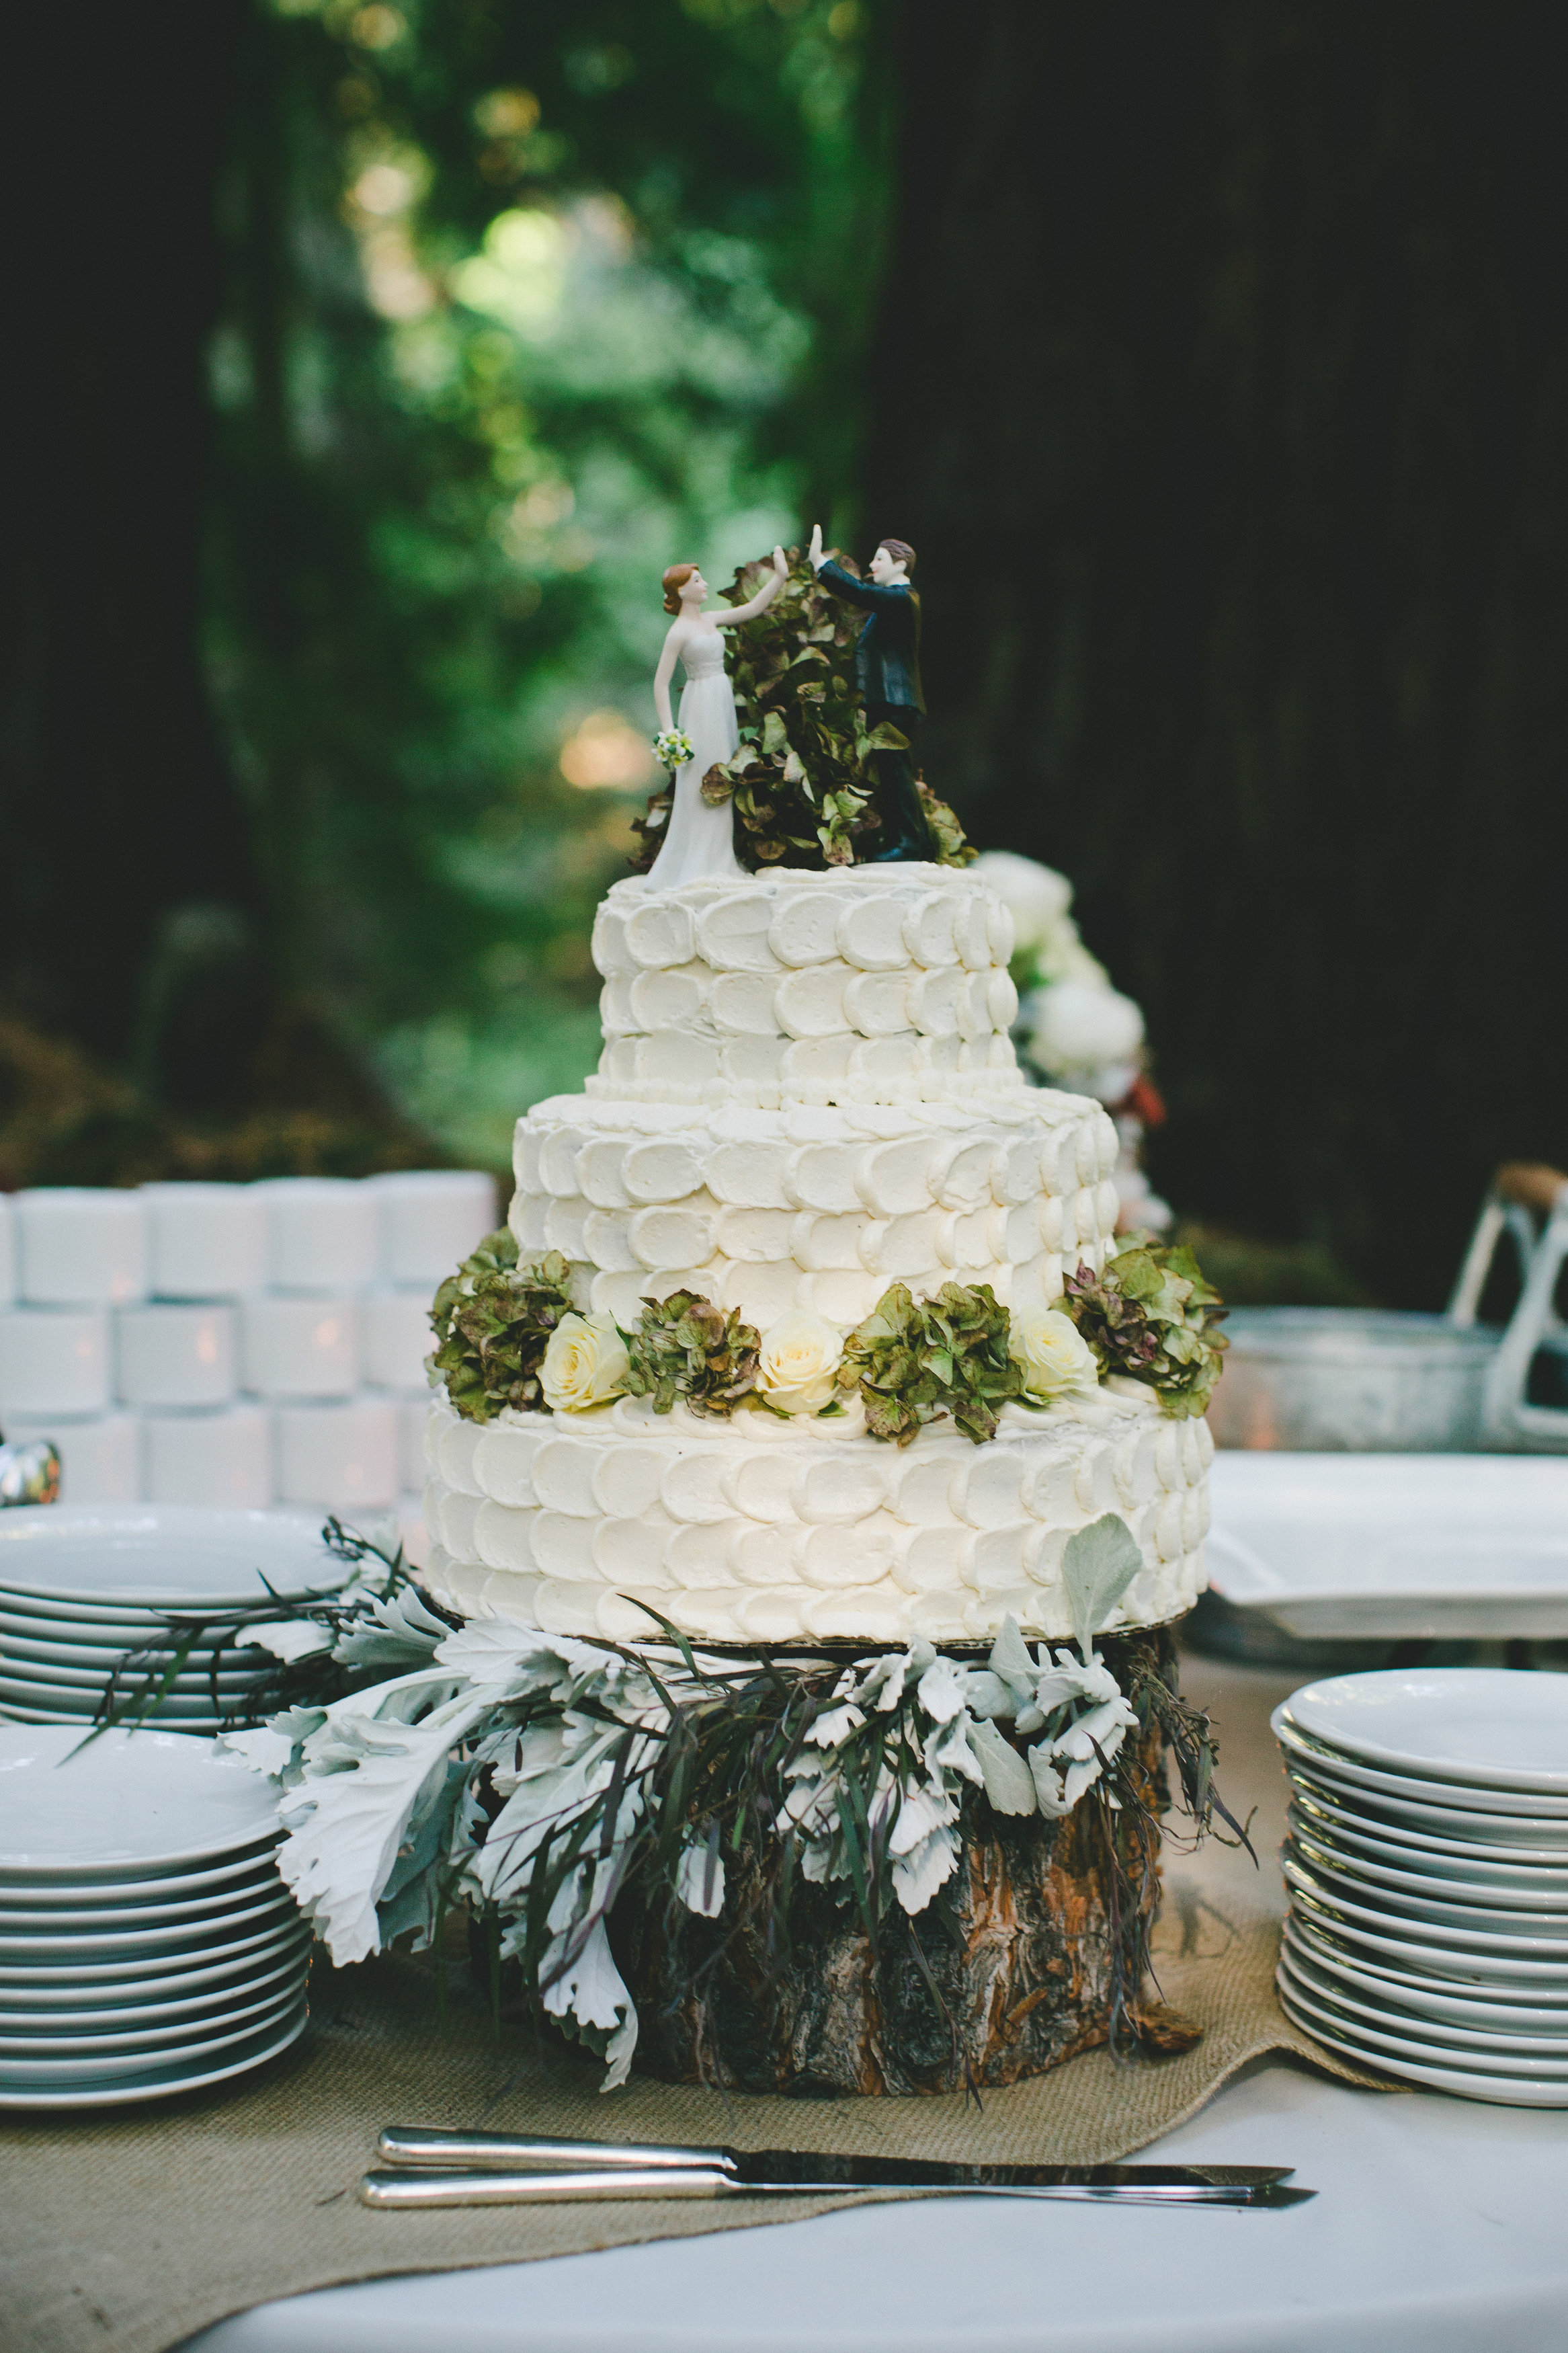 Wedding_Cake_Chocolate_Espresso_Cake_Golden_Yellow_Cake_Vanilla_Buttercream_Frosting_Dessert_Fiend.jpg